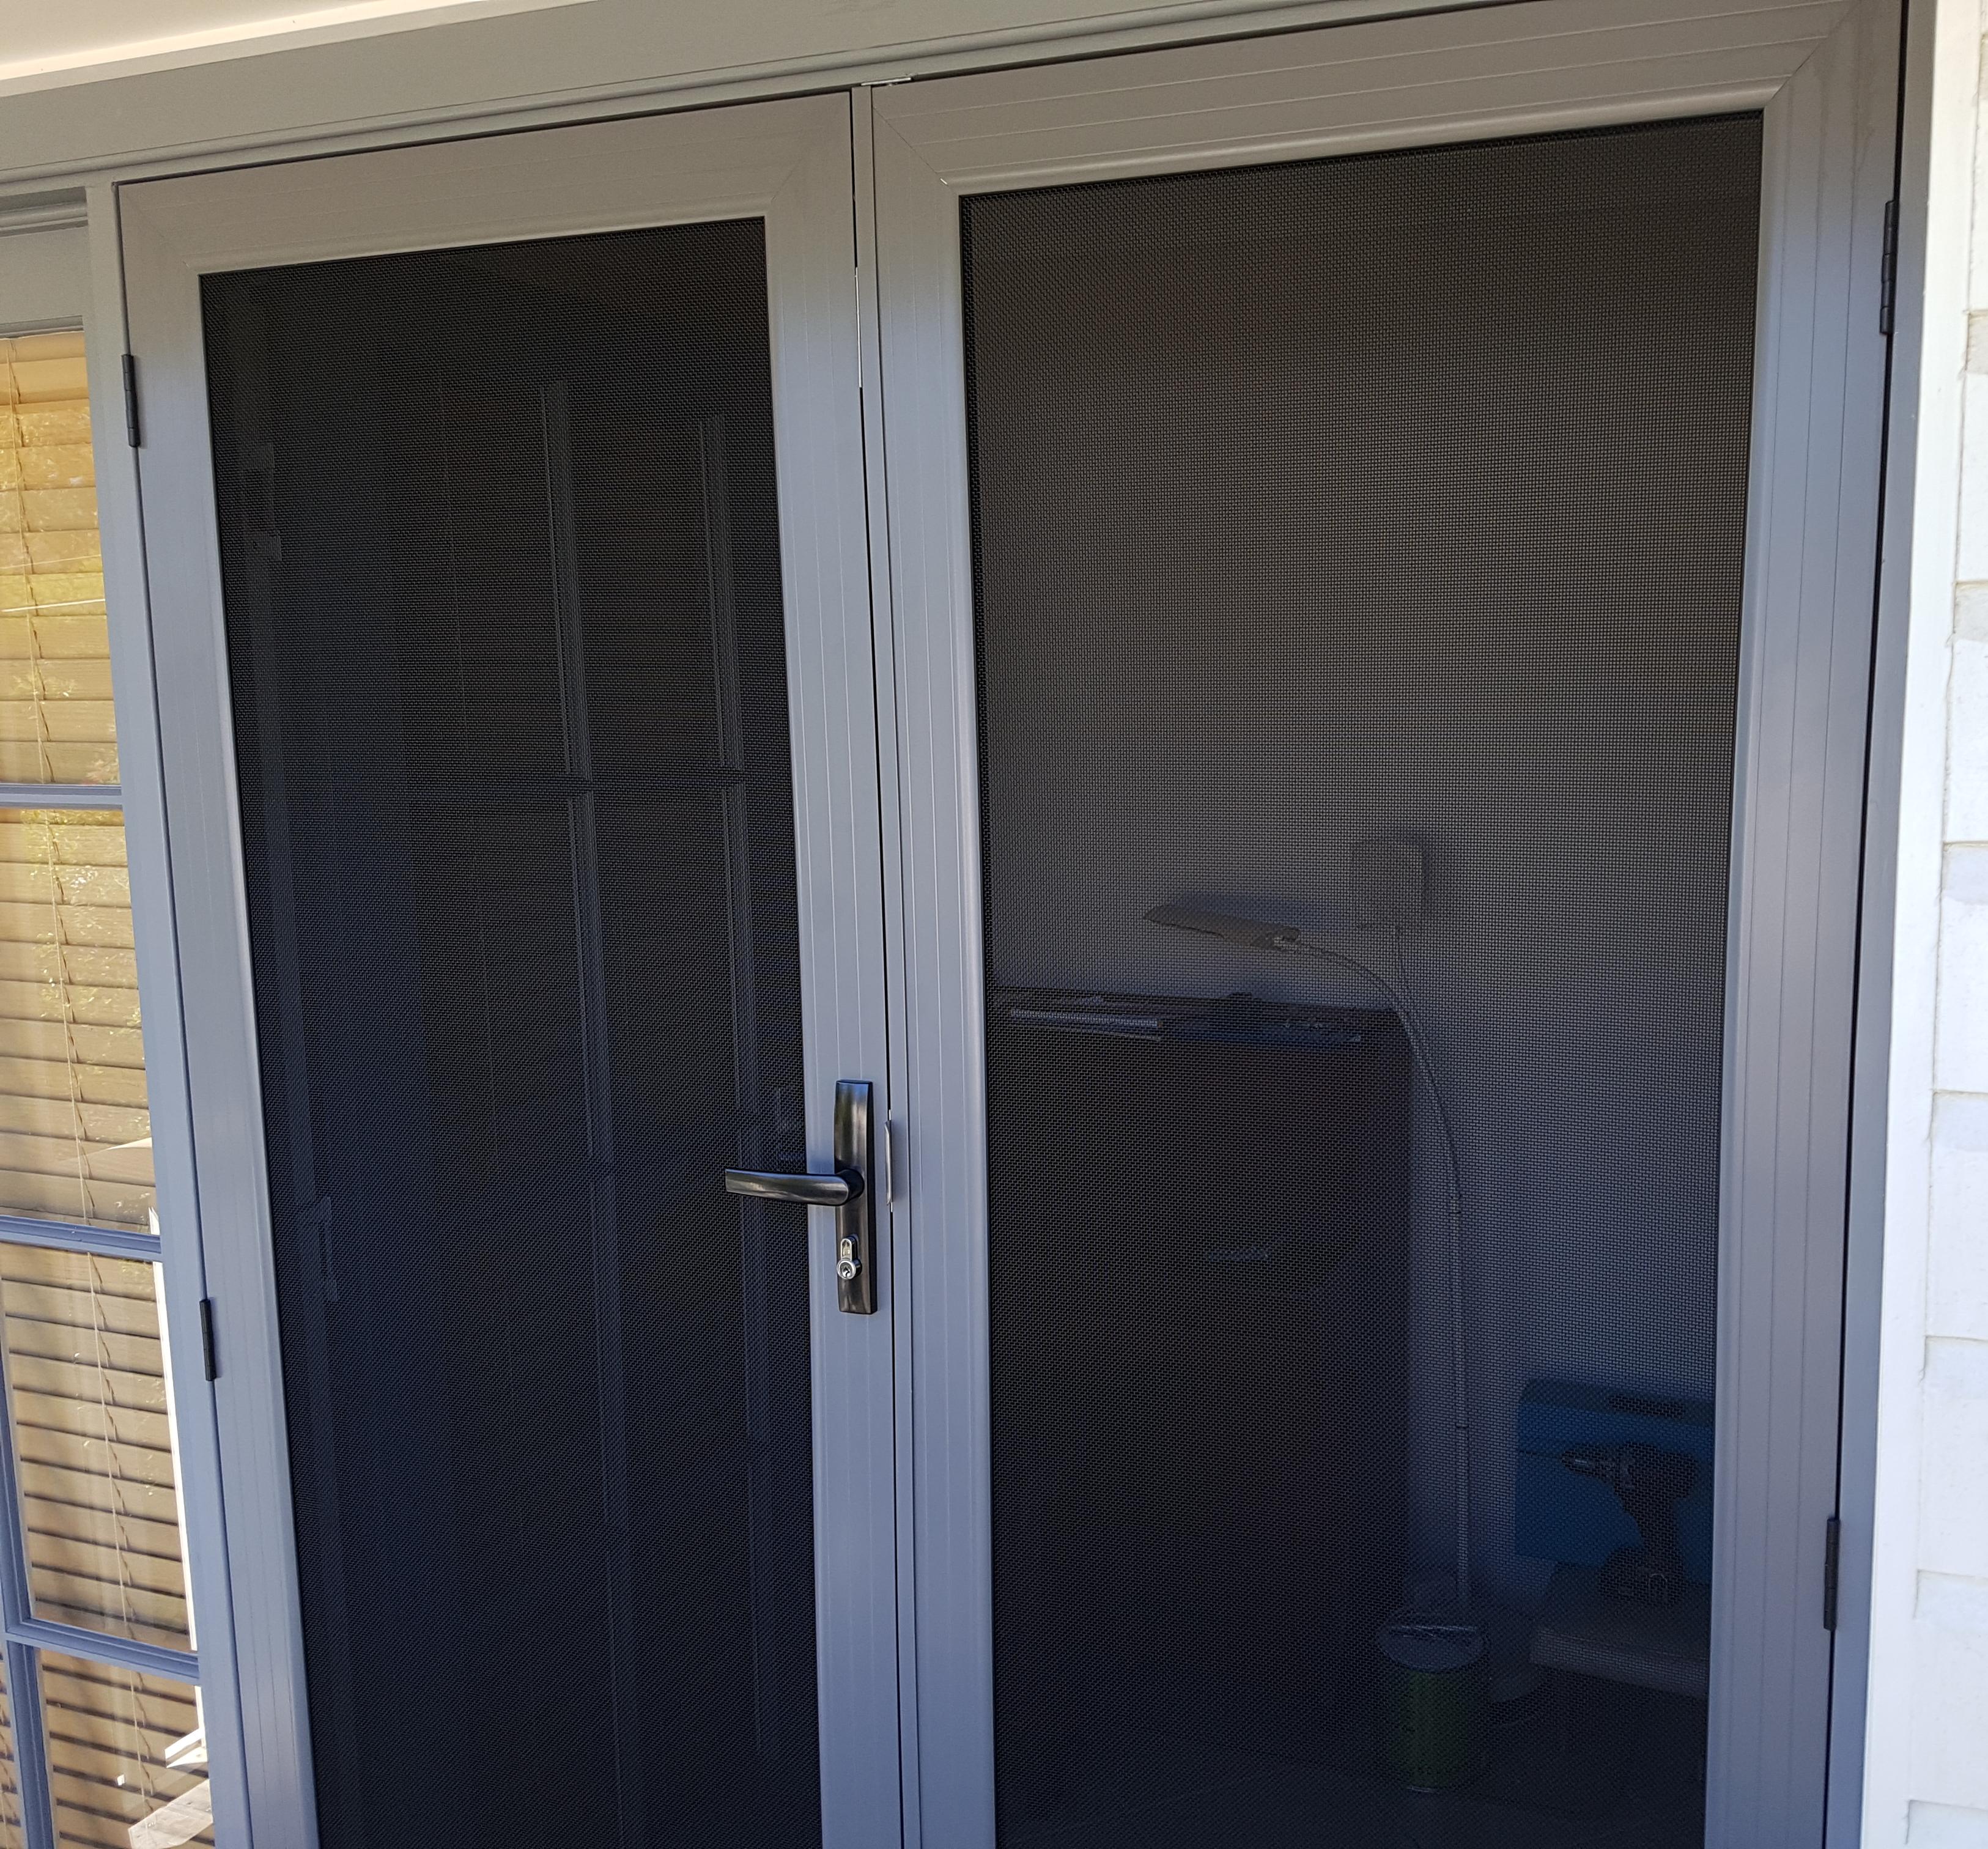 Sandgate - hinged security door to balcony